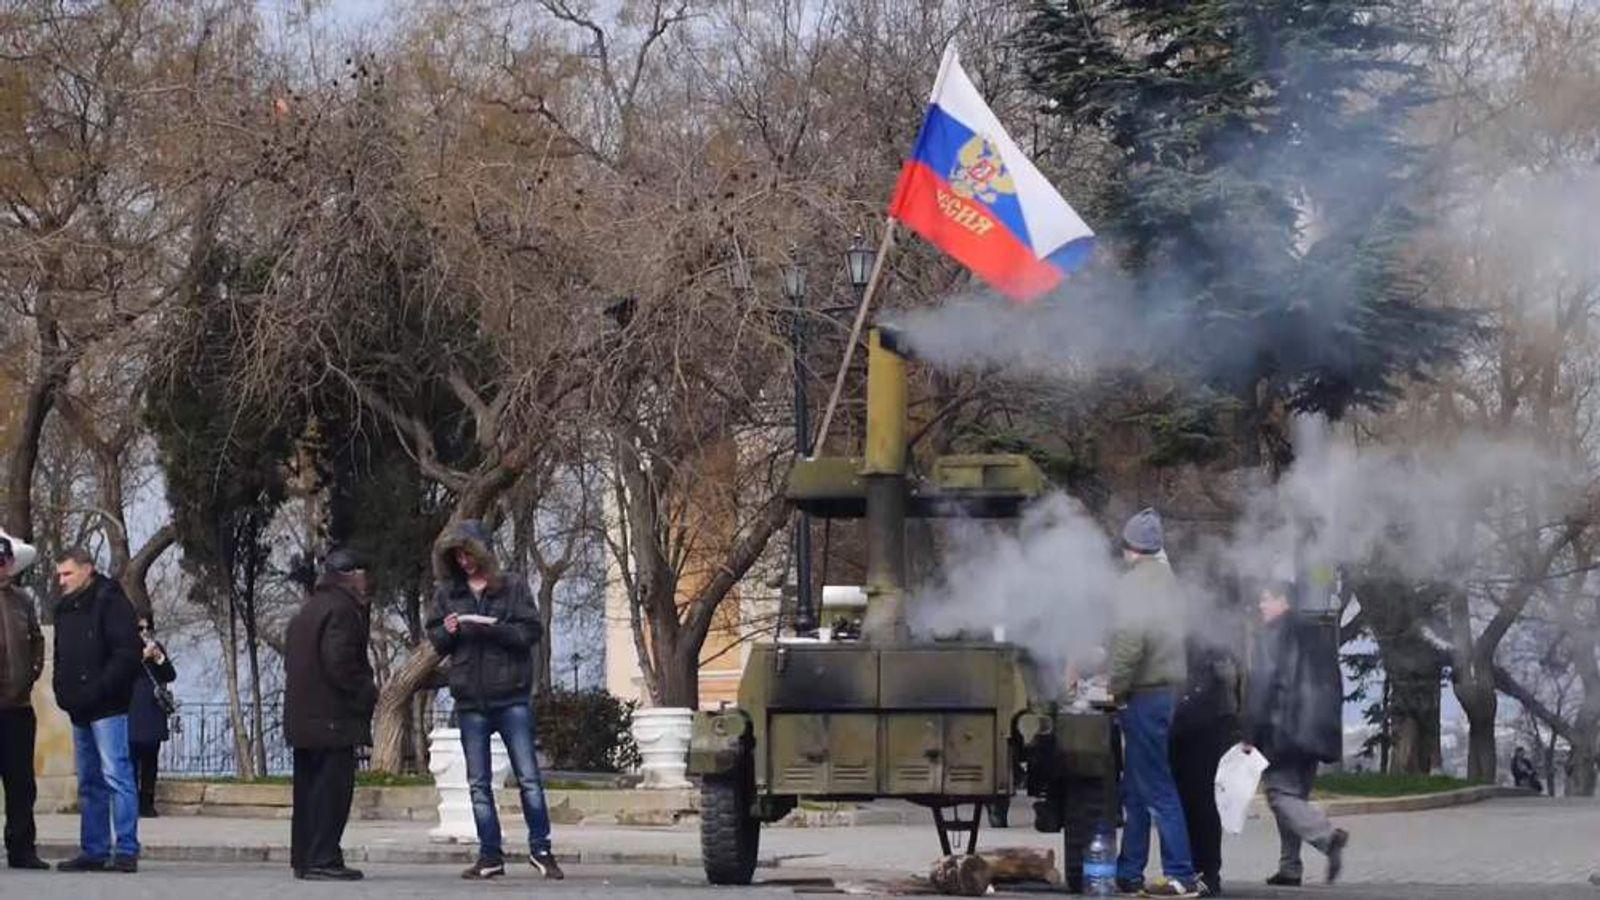 Protesters raise a Russian flag in Crimea, Ukraine